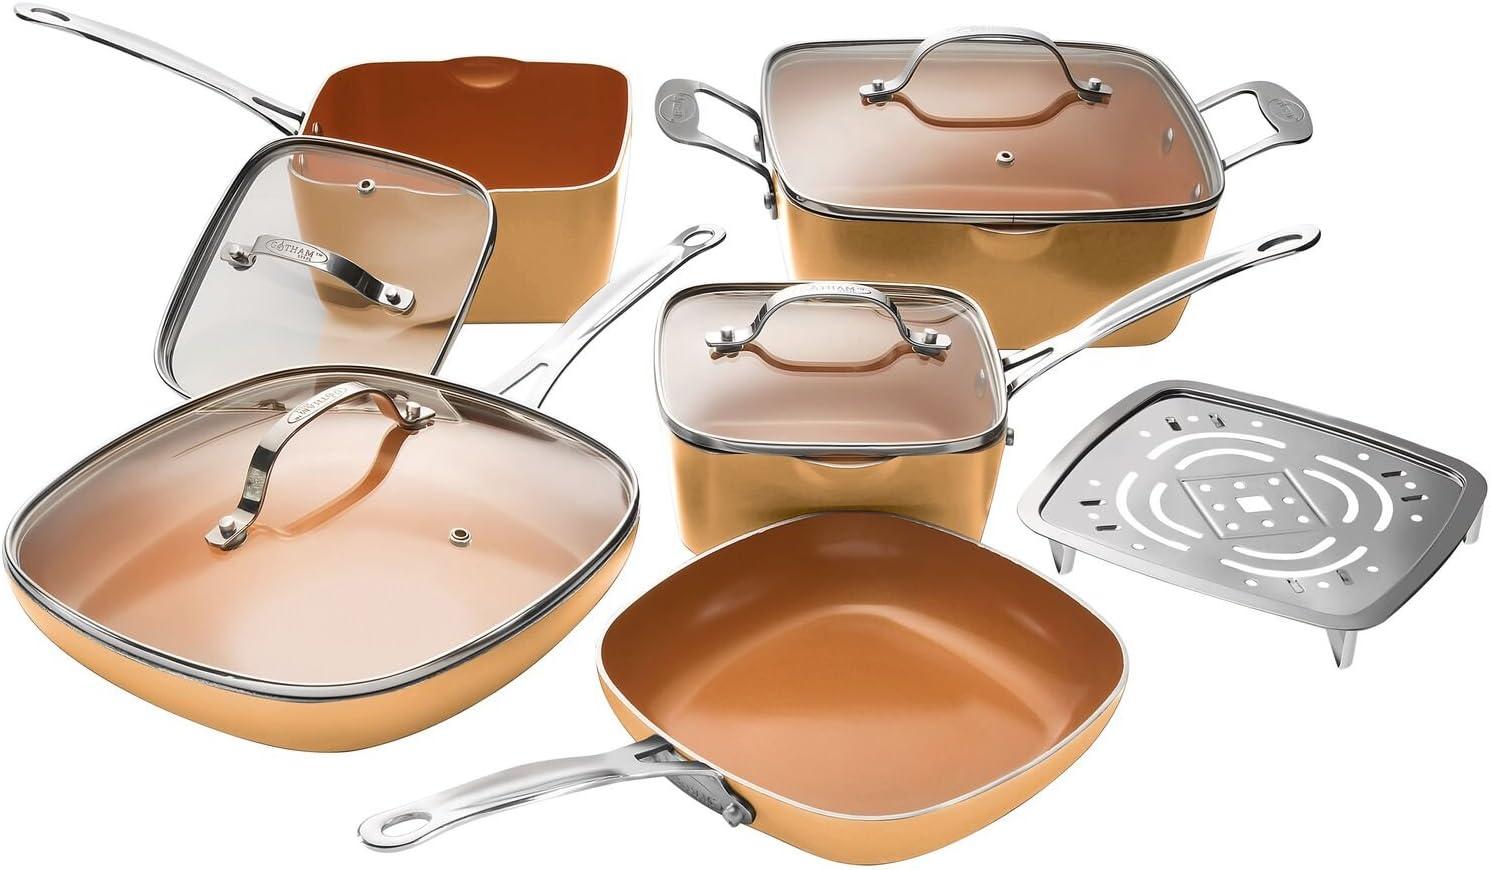 Gotham Steel Nonstick 10 Piece Square Cookware Set, Large, Copper